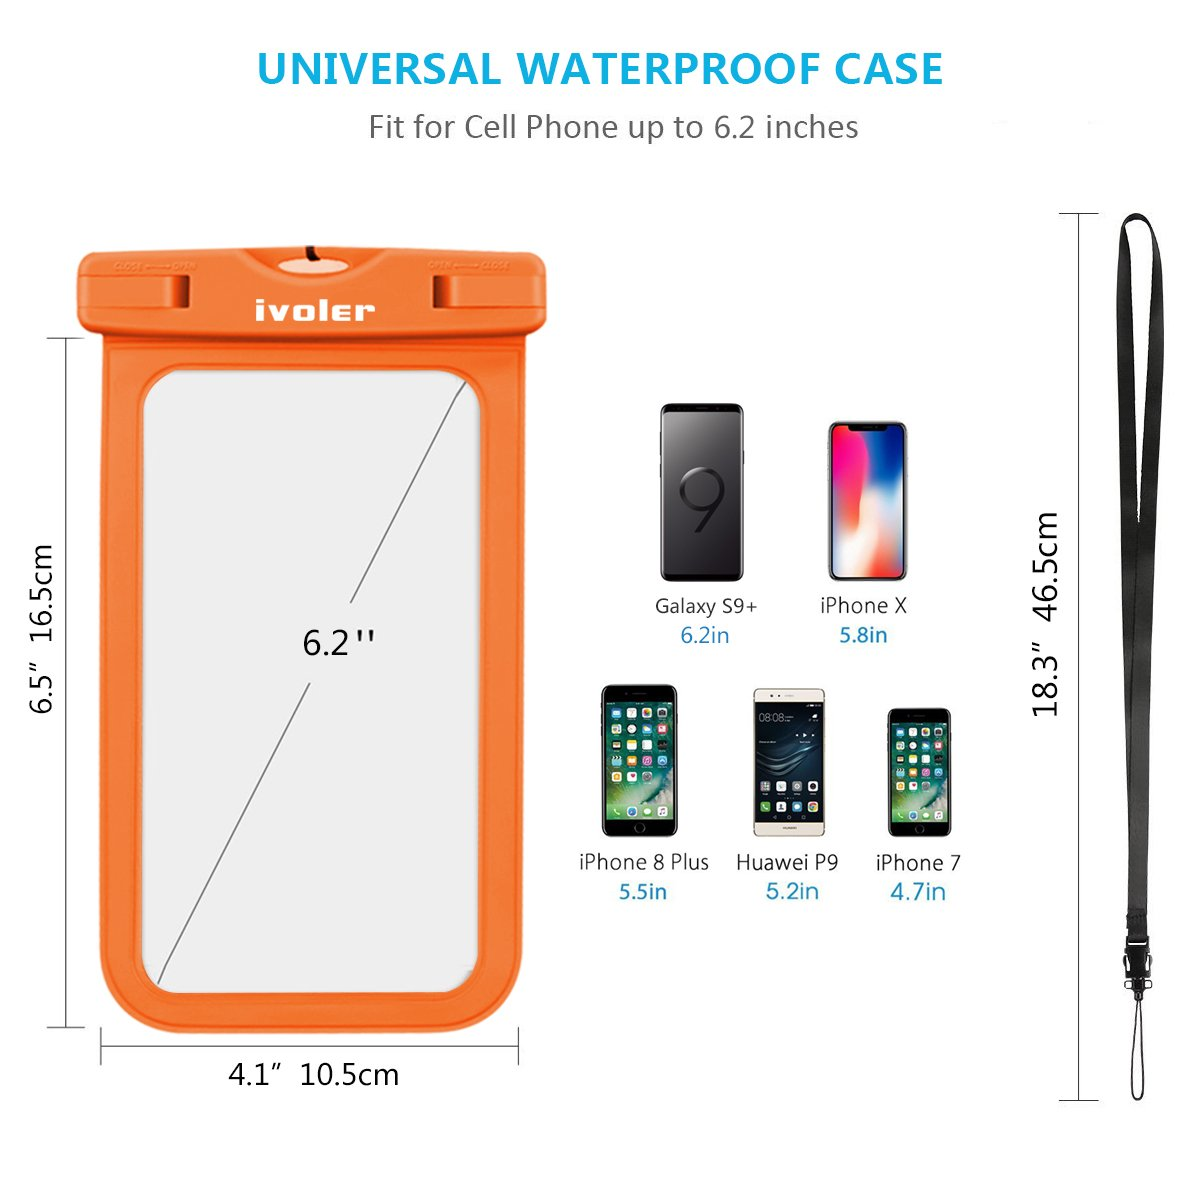 Pasaporte Funda Bolsa M/óvil Impermeable Universal para Xiaomi Samsung Galaxy etc. iVoler Smartphones Huawei IPX8 Certificado iPhone 4 Unidades Monedas Negro//Azul//Verde//Naranja